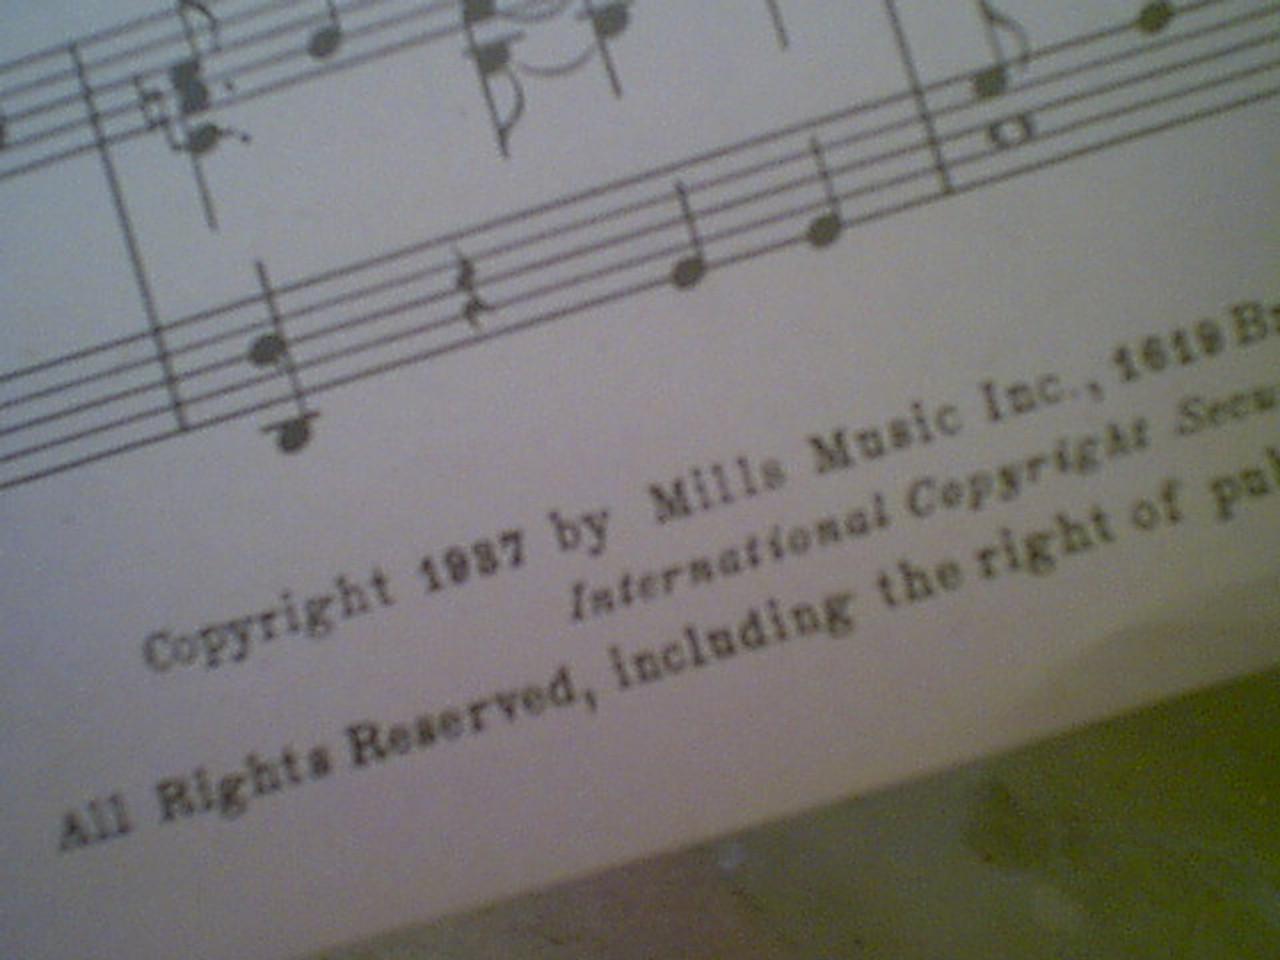 "Robinson, Bill & Cab Calloway ""She'S Tall She'S Tan She'S Terrific"" 1937 Sheet Music Signed Autograph Cotton Club Parade Photos"